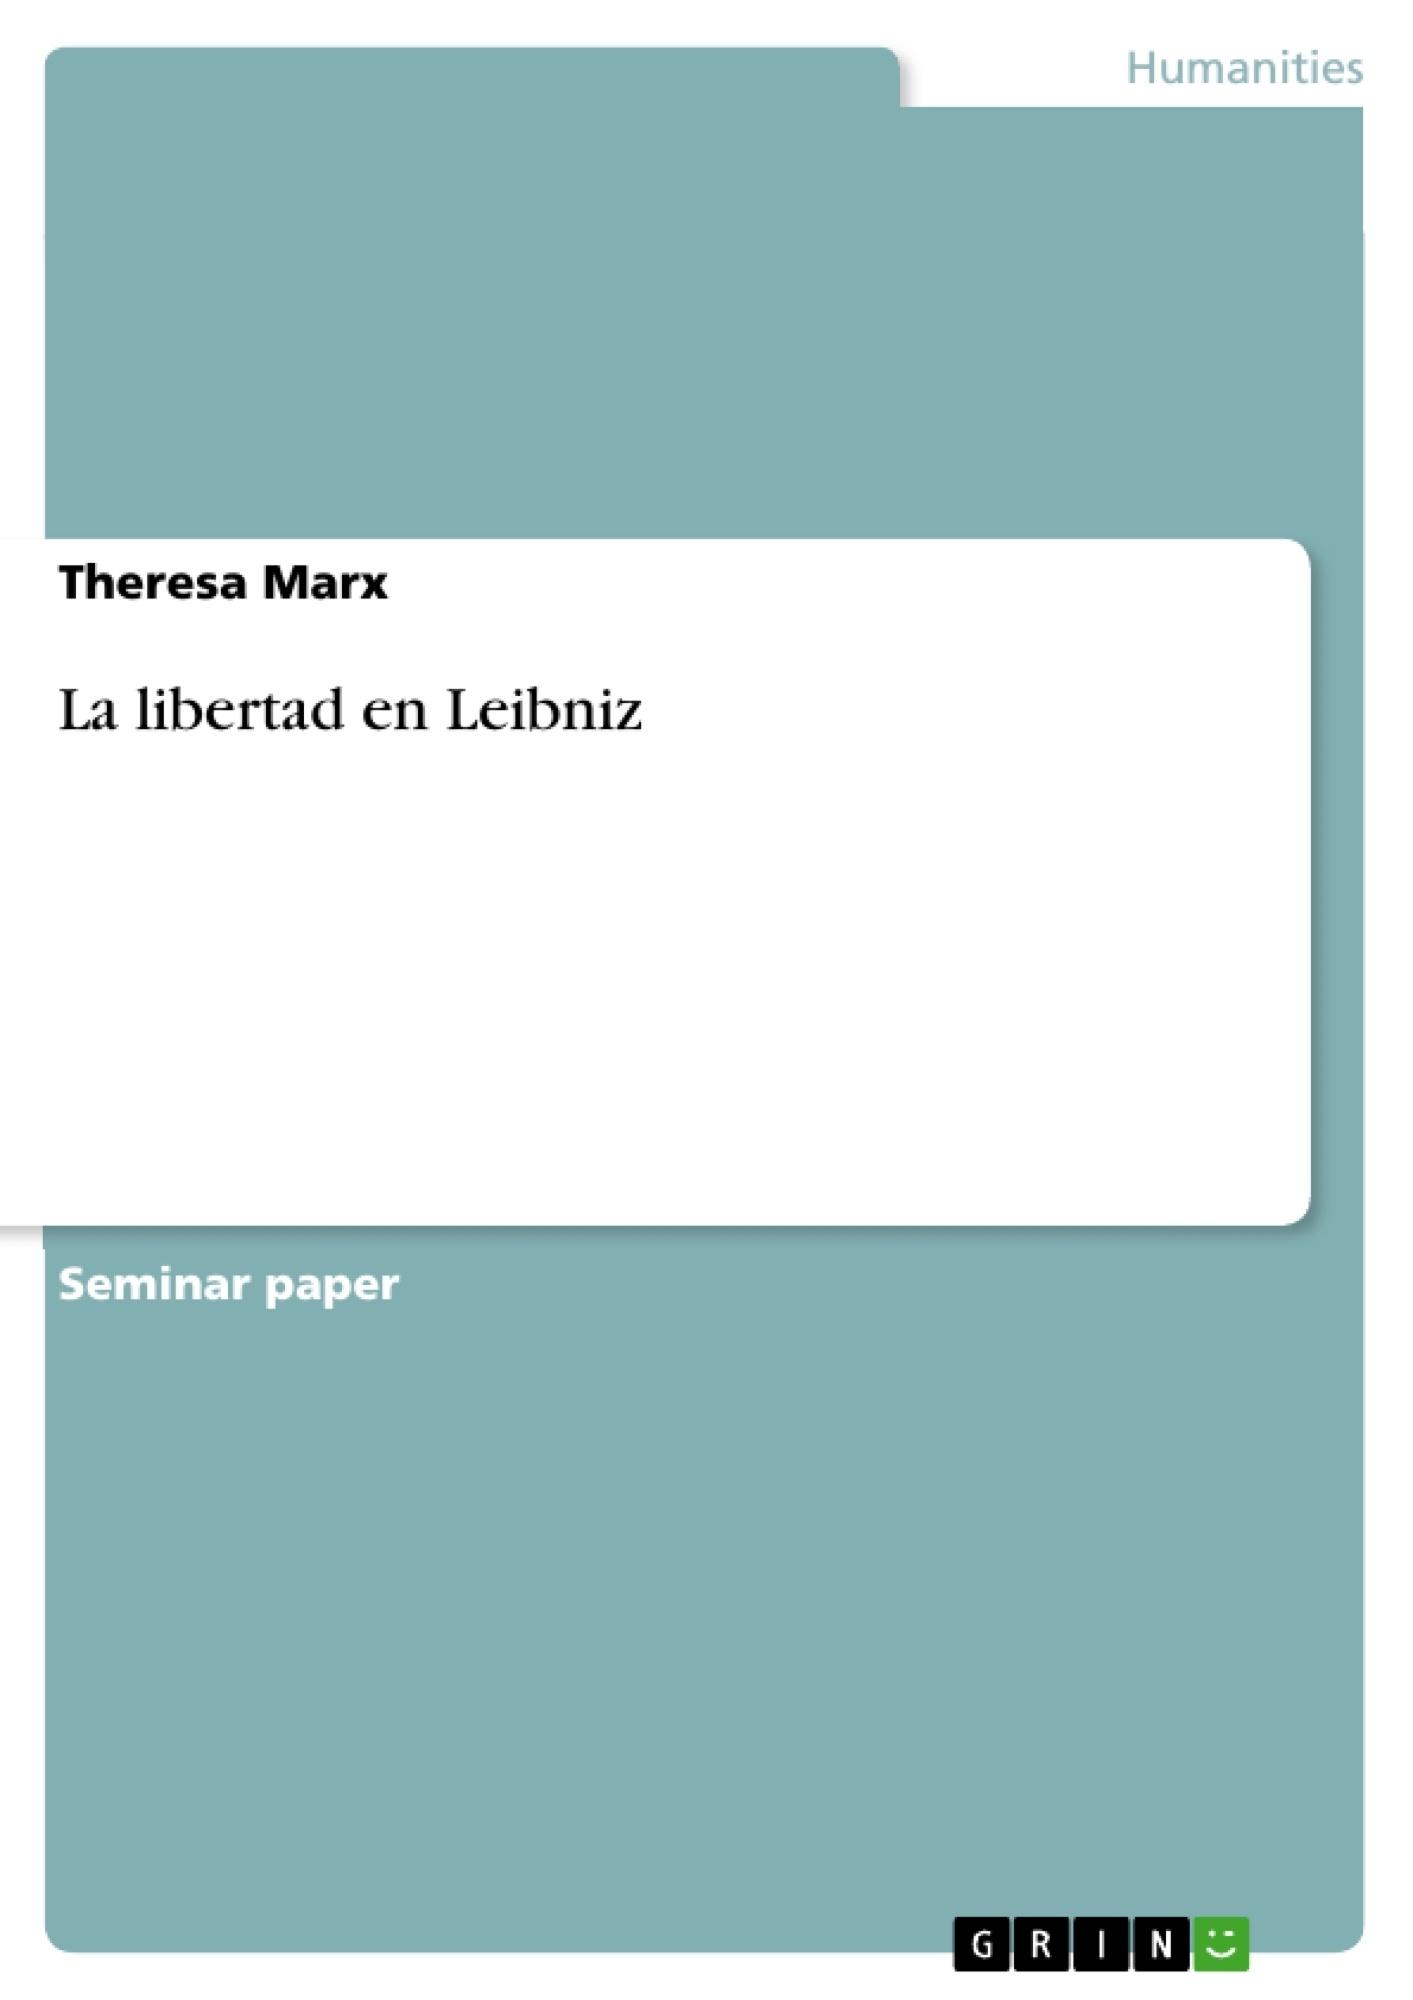 Título: La libertad en Leibniz